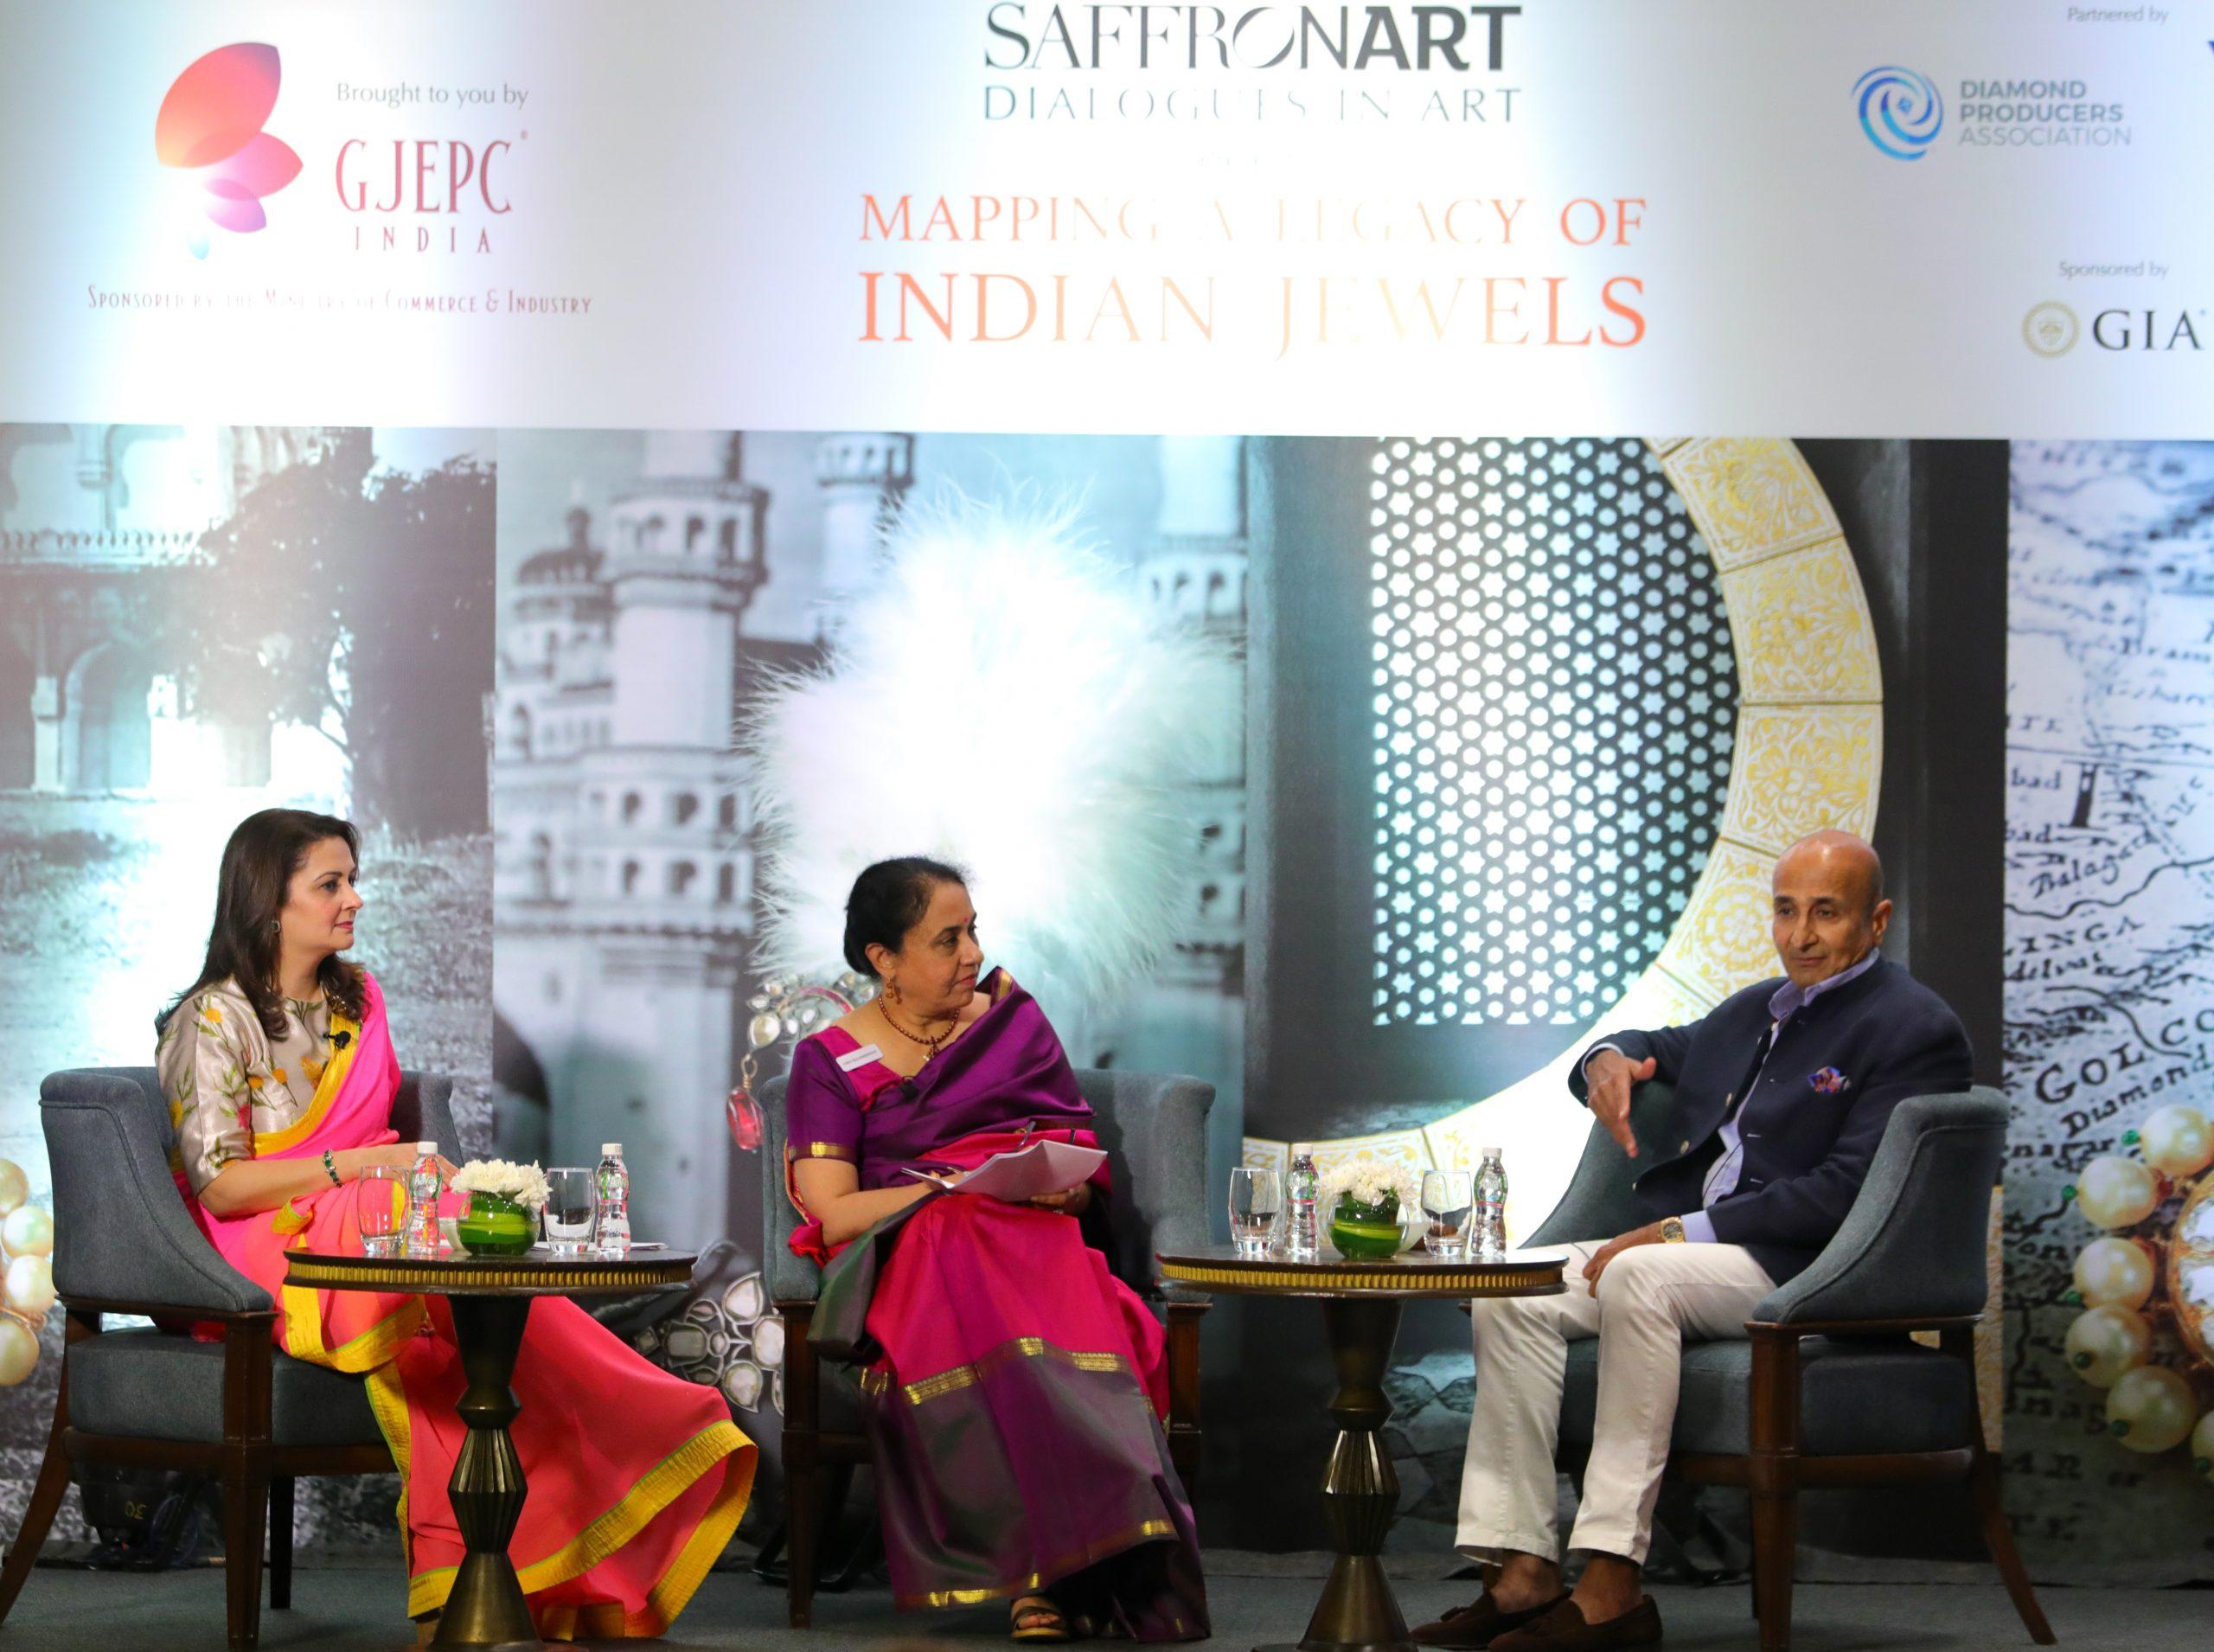 Viren Bhagat in conversation with Minal Vazirani and Dr. Usha Balakrishnan